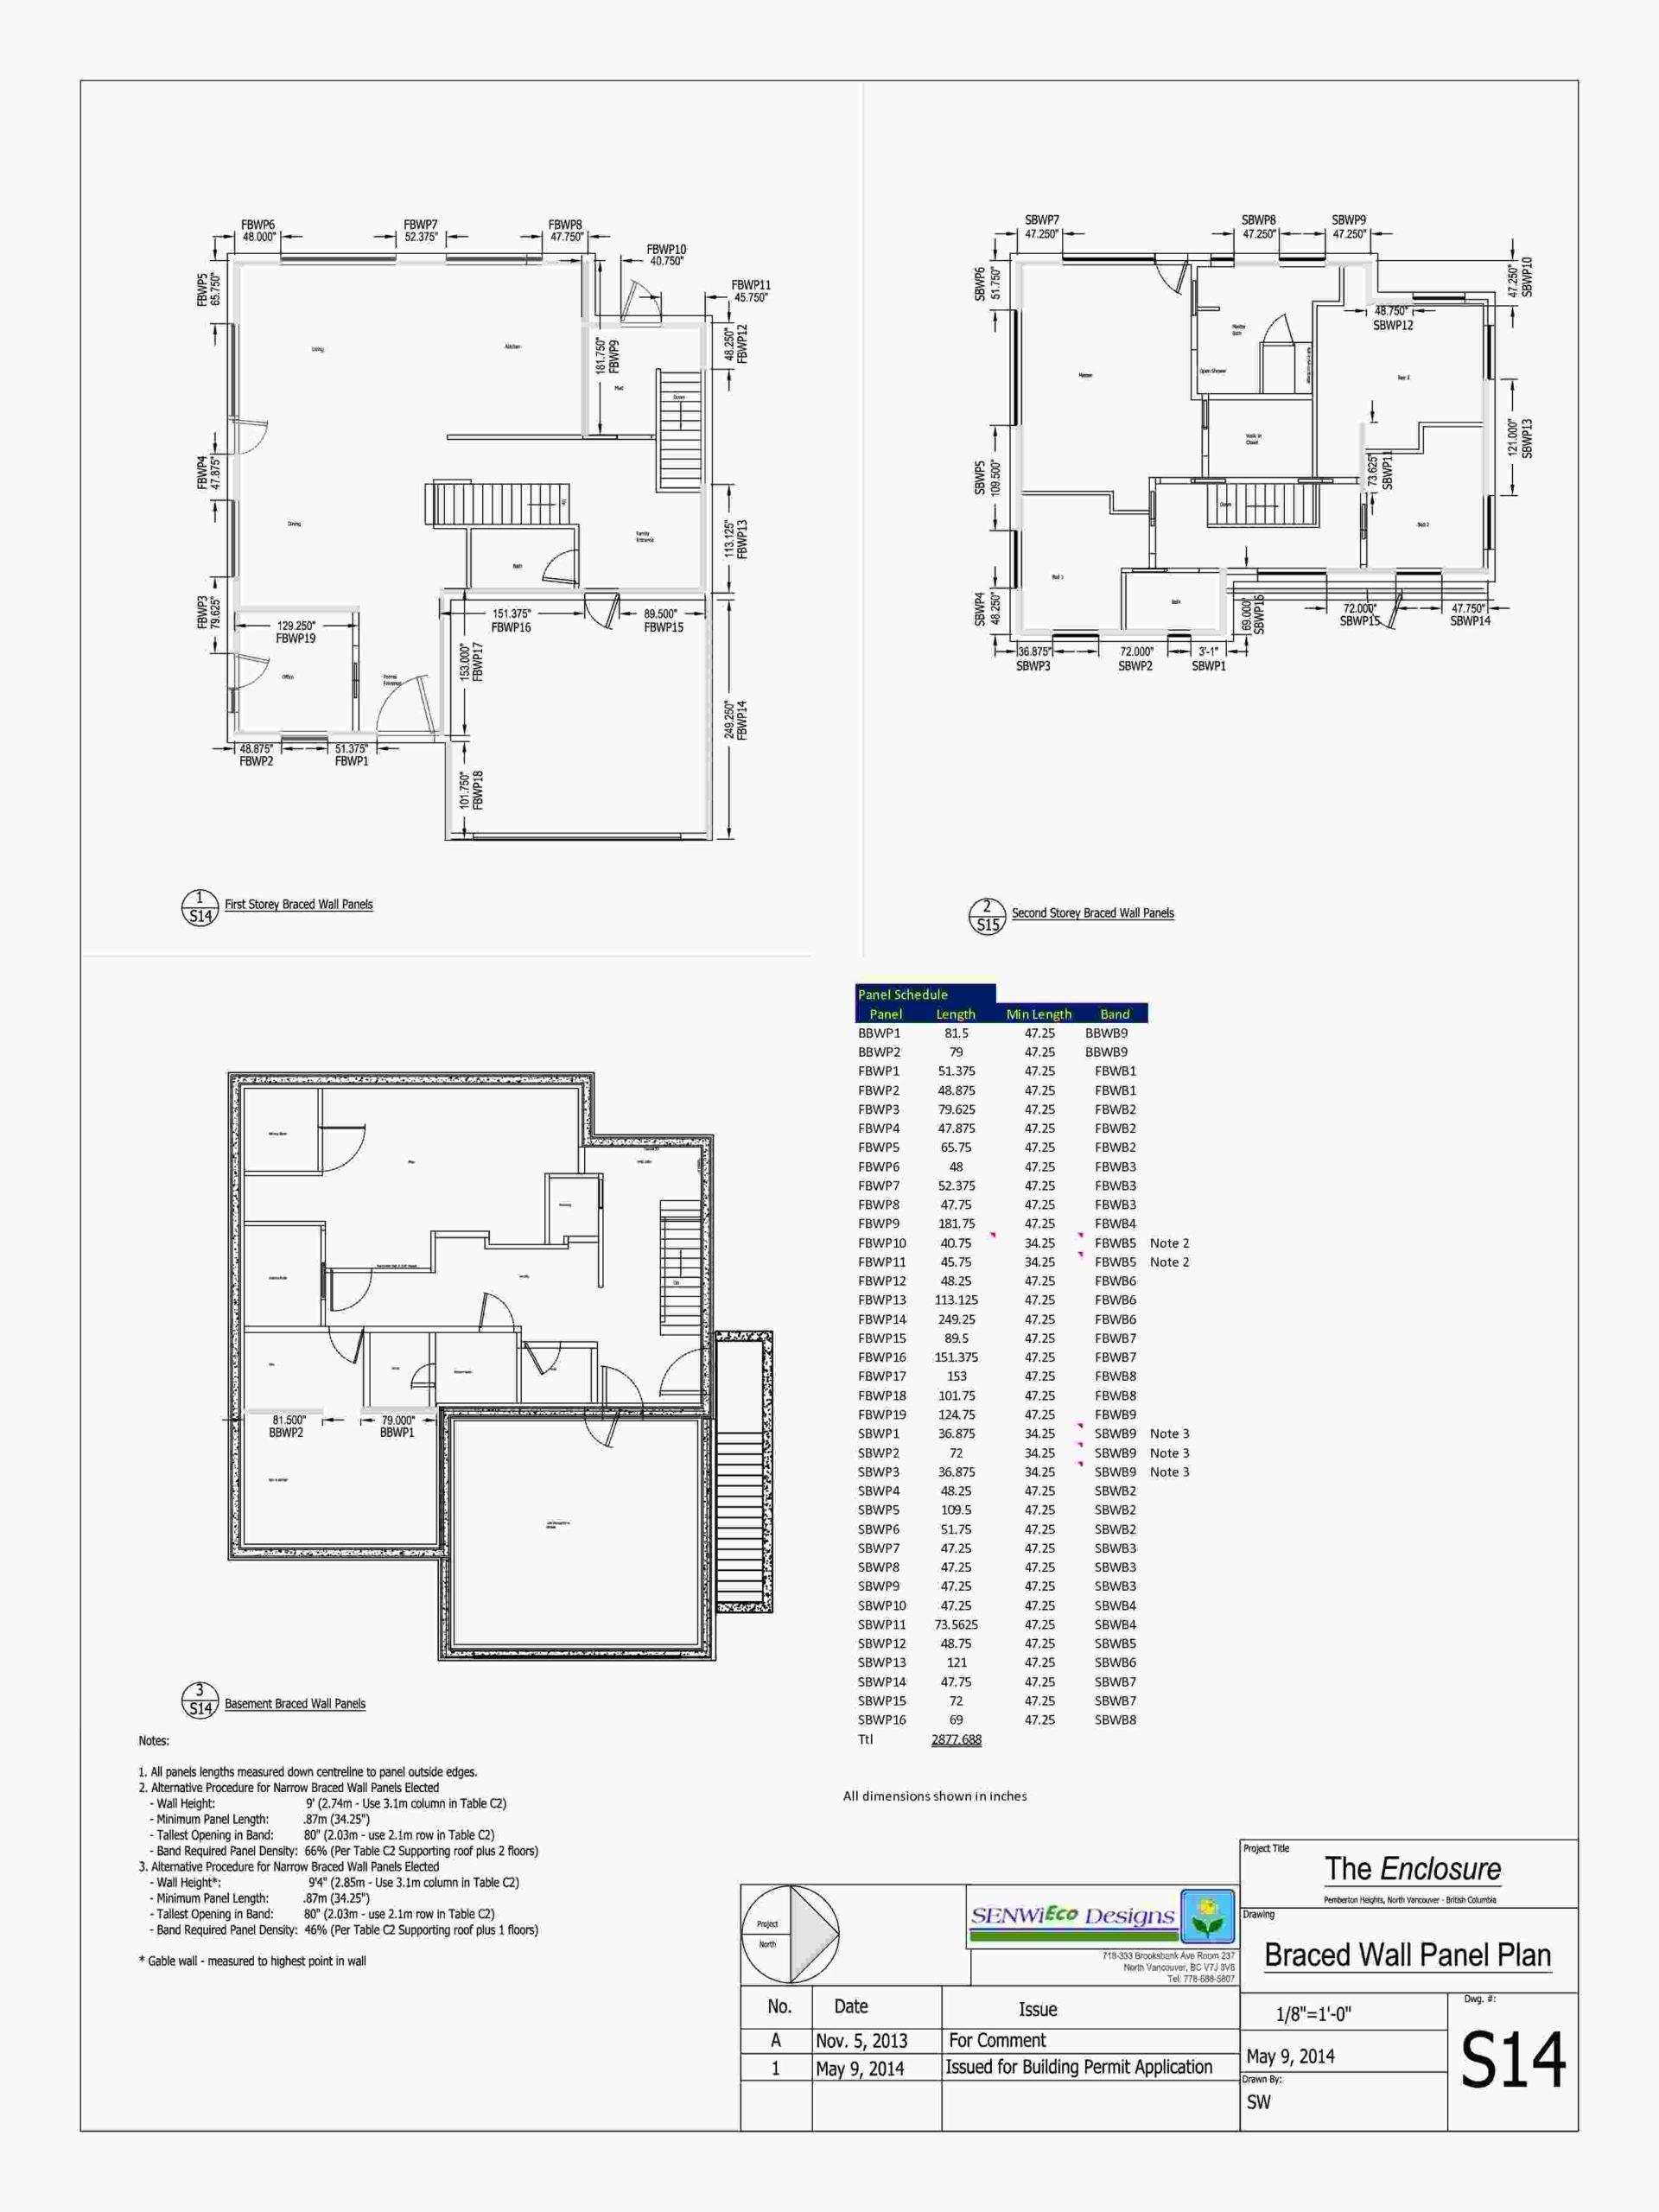 S14 - Braced Wall Panel Plan 001